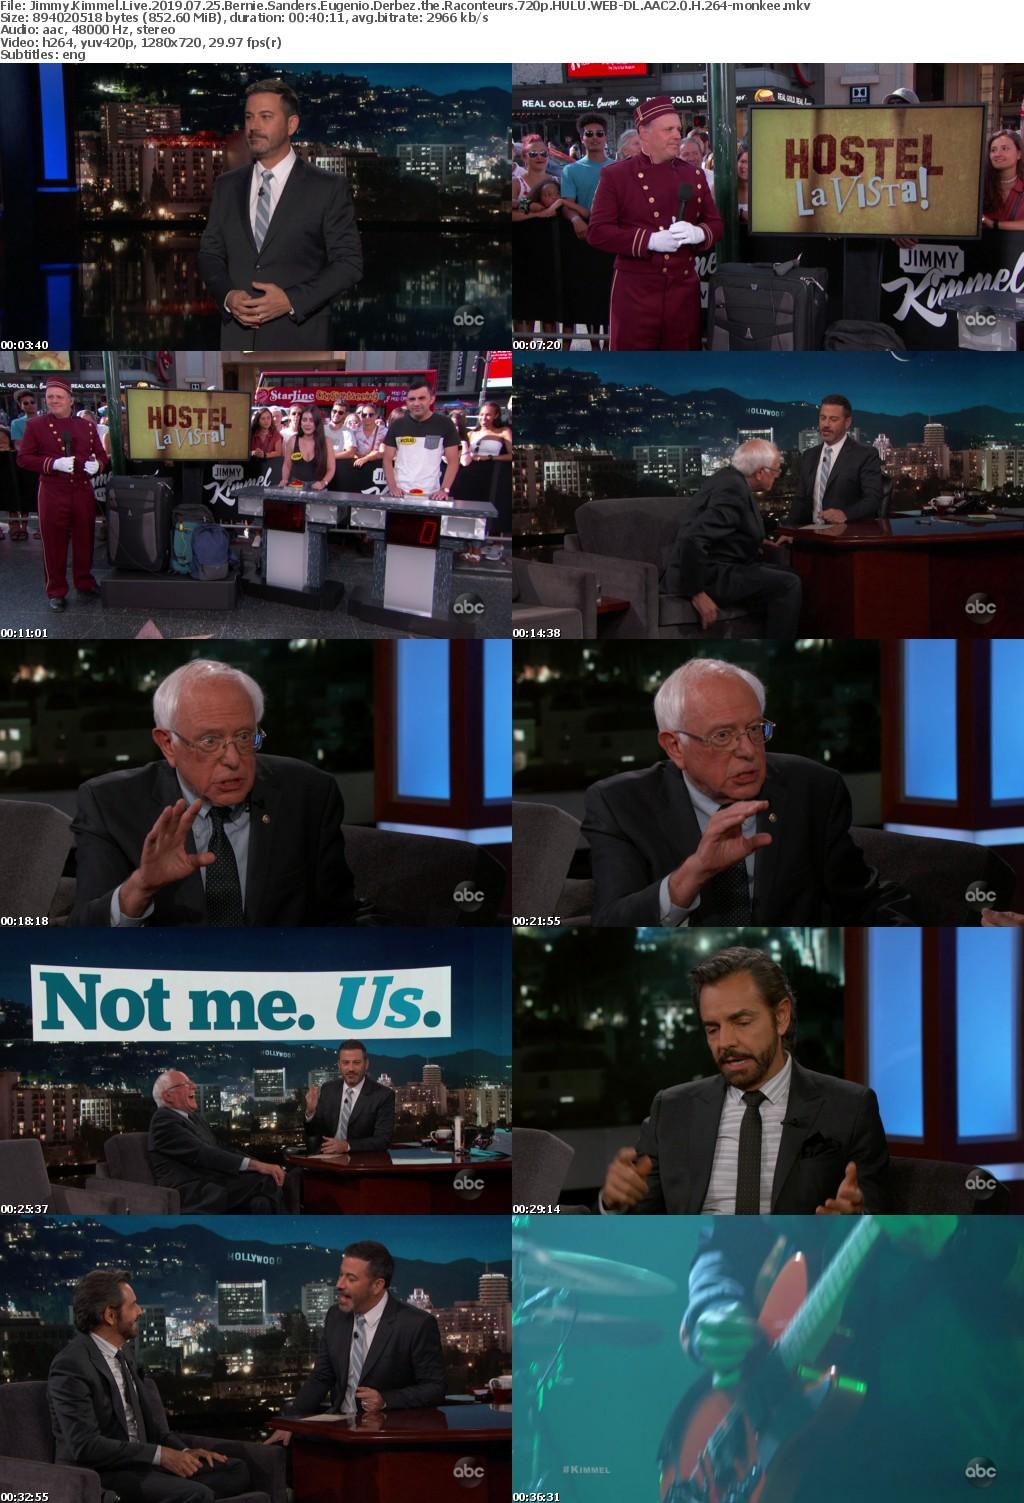 Jimmy Kimmel Live 2019 07 25 Bernie Sanders Eugenio Derbez the Raconteurs 720p HULU WEB-DL AAC2 0 H 264-monkee